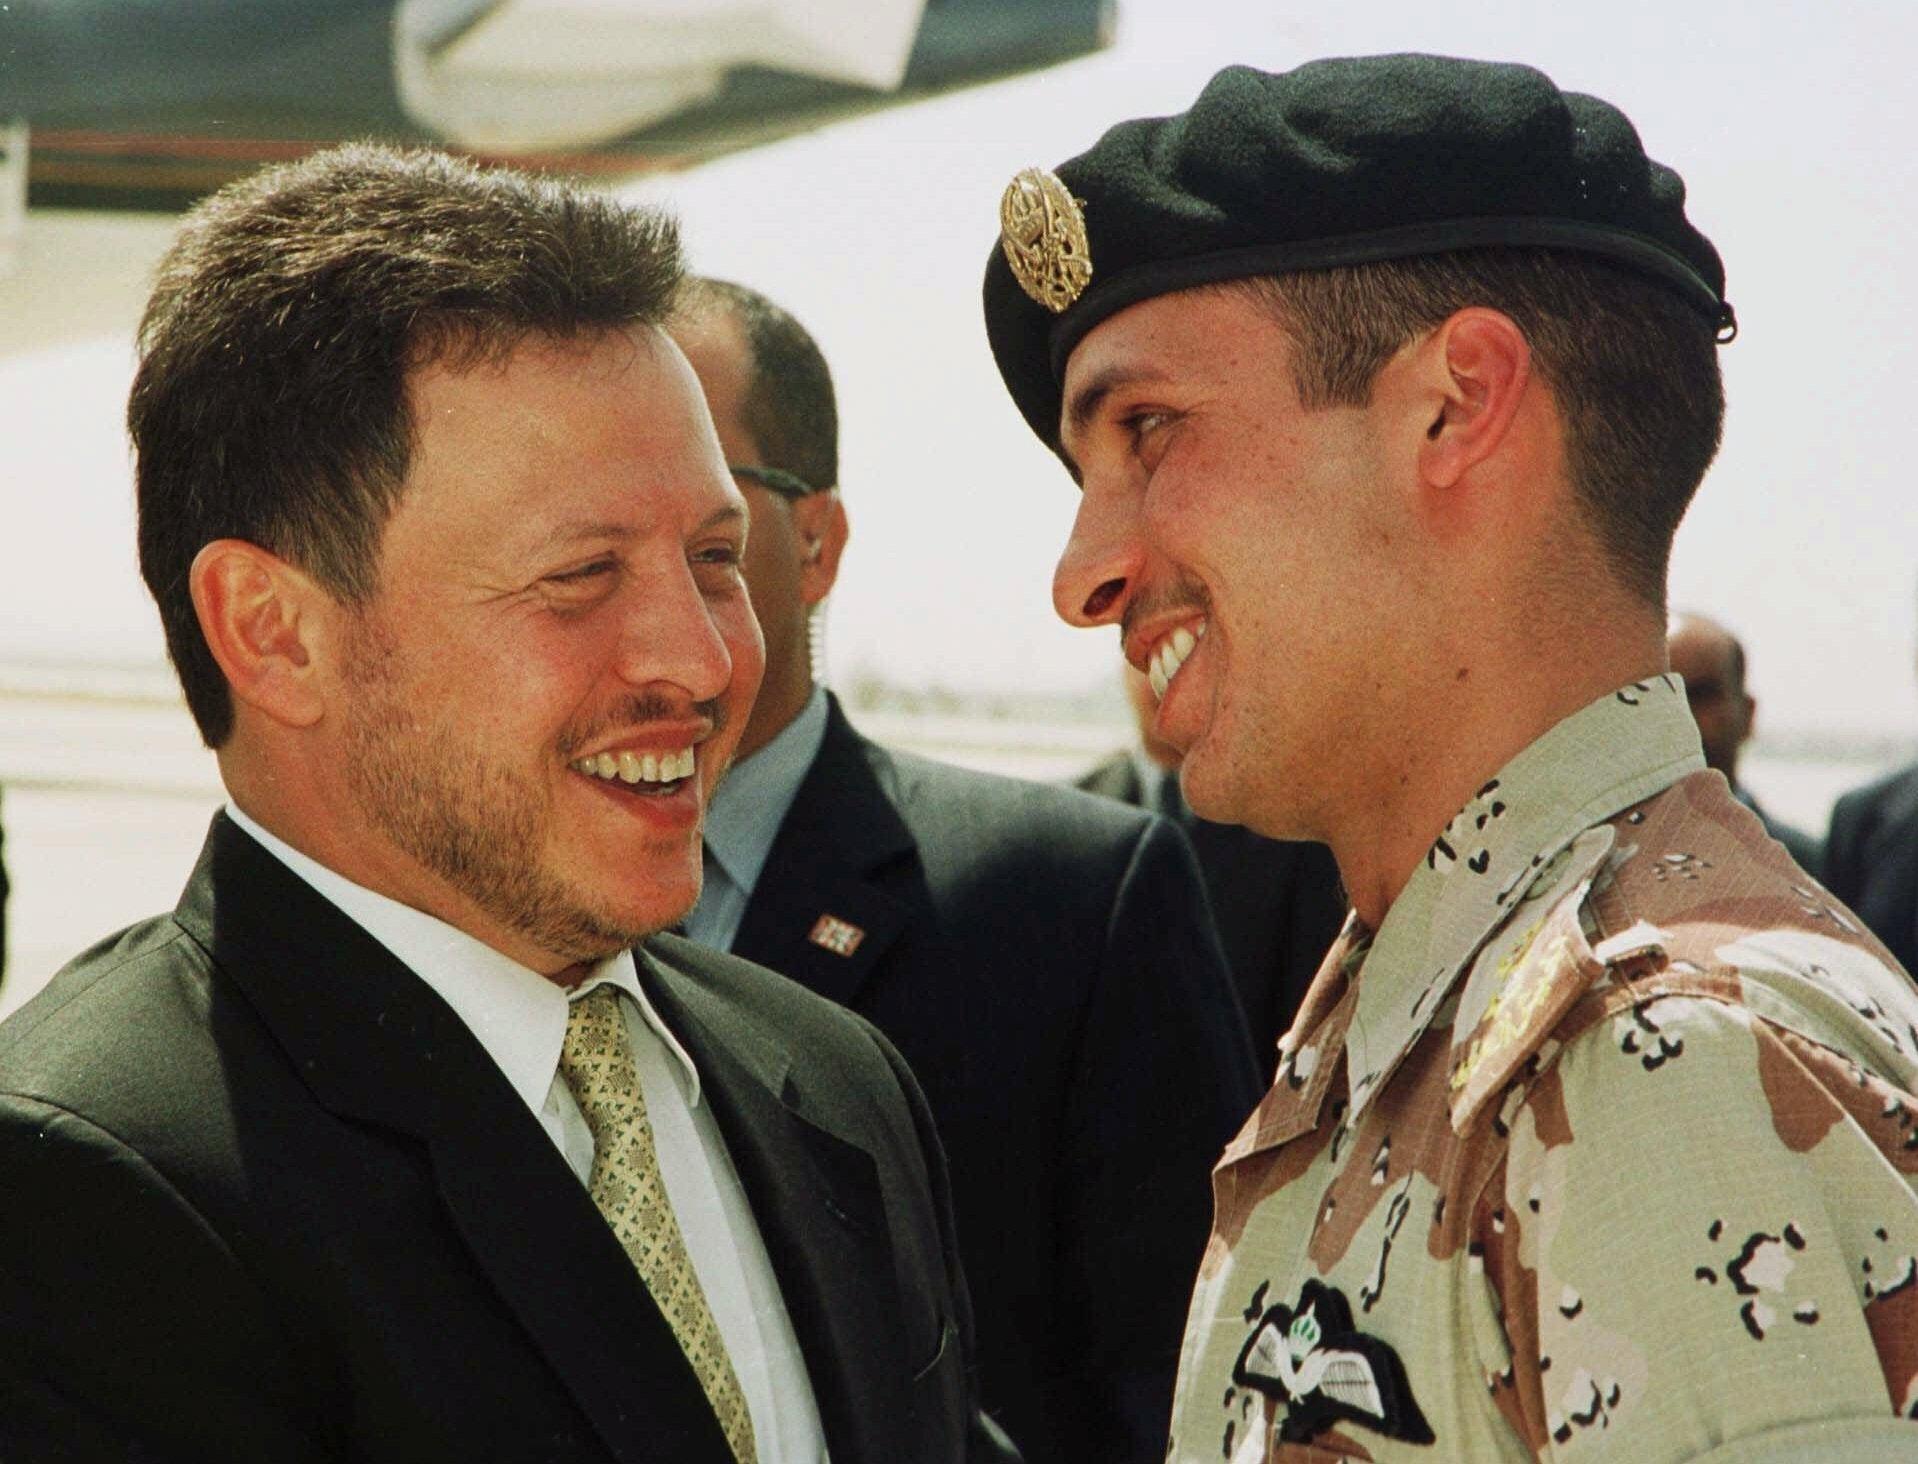 King Abdullah andPrince Hamza